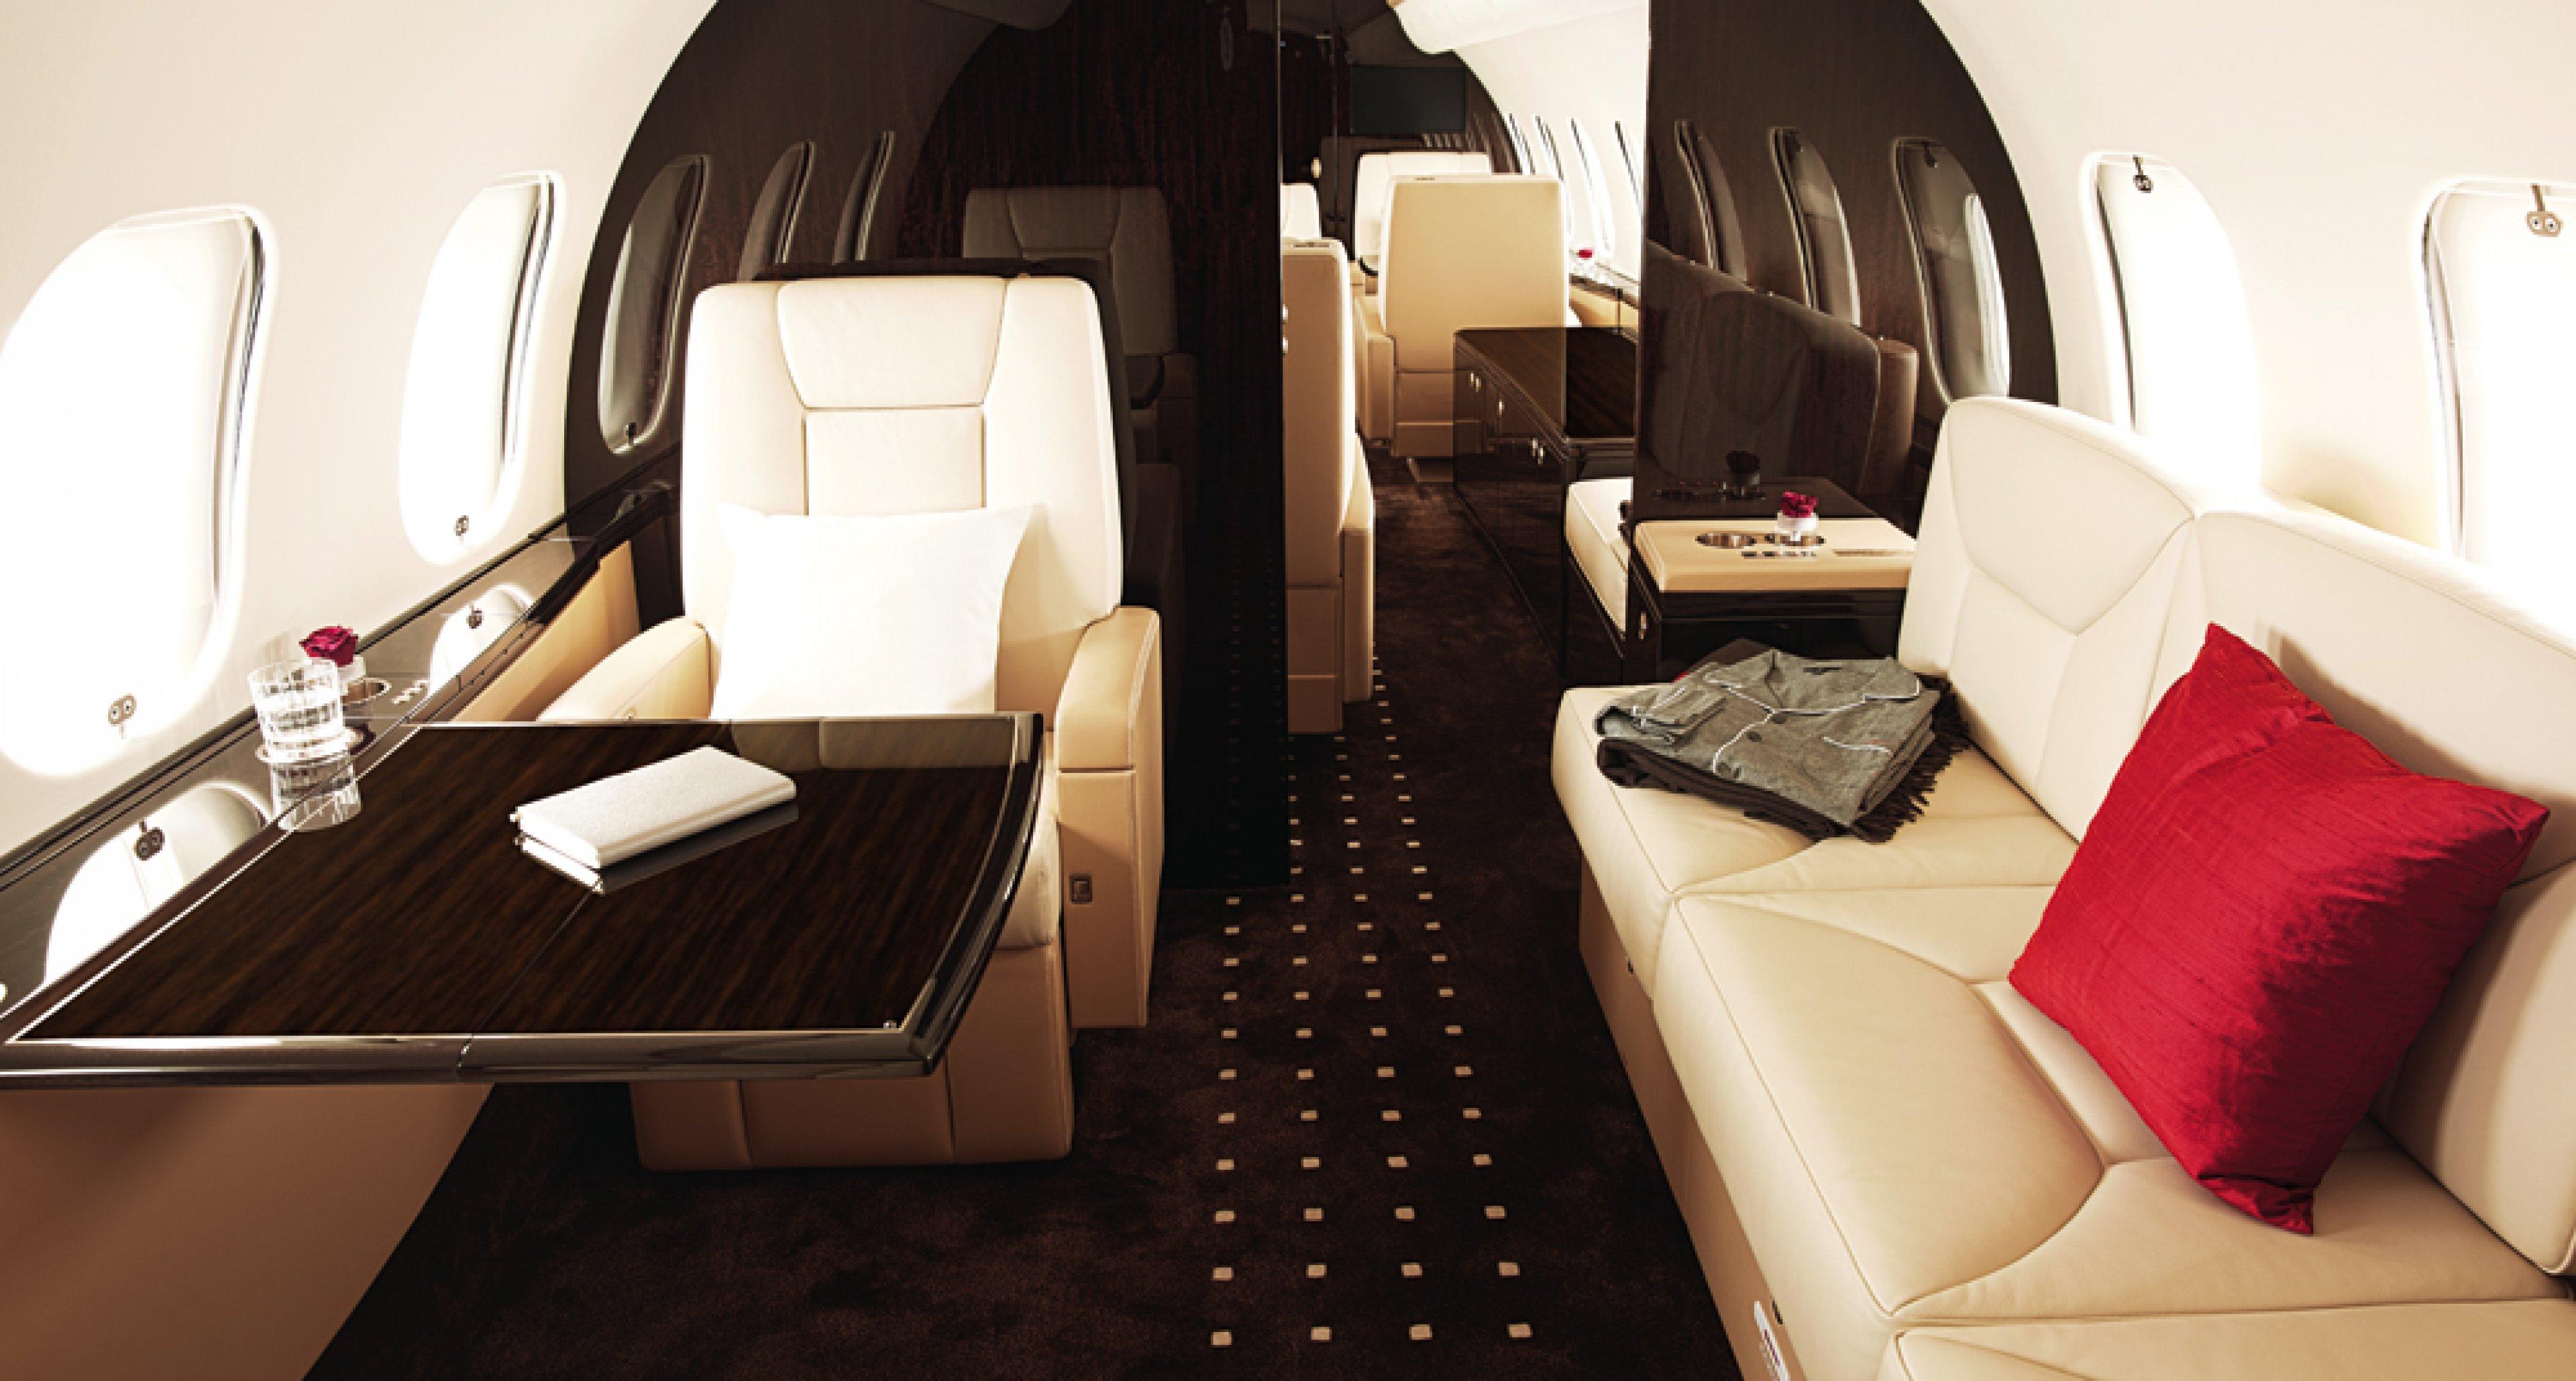 Bombardier Global 5000 jet with VistaJet interior,  Alain Girard/Blue Storm Média © VistaJet